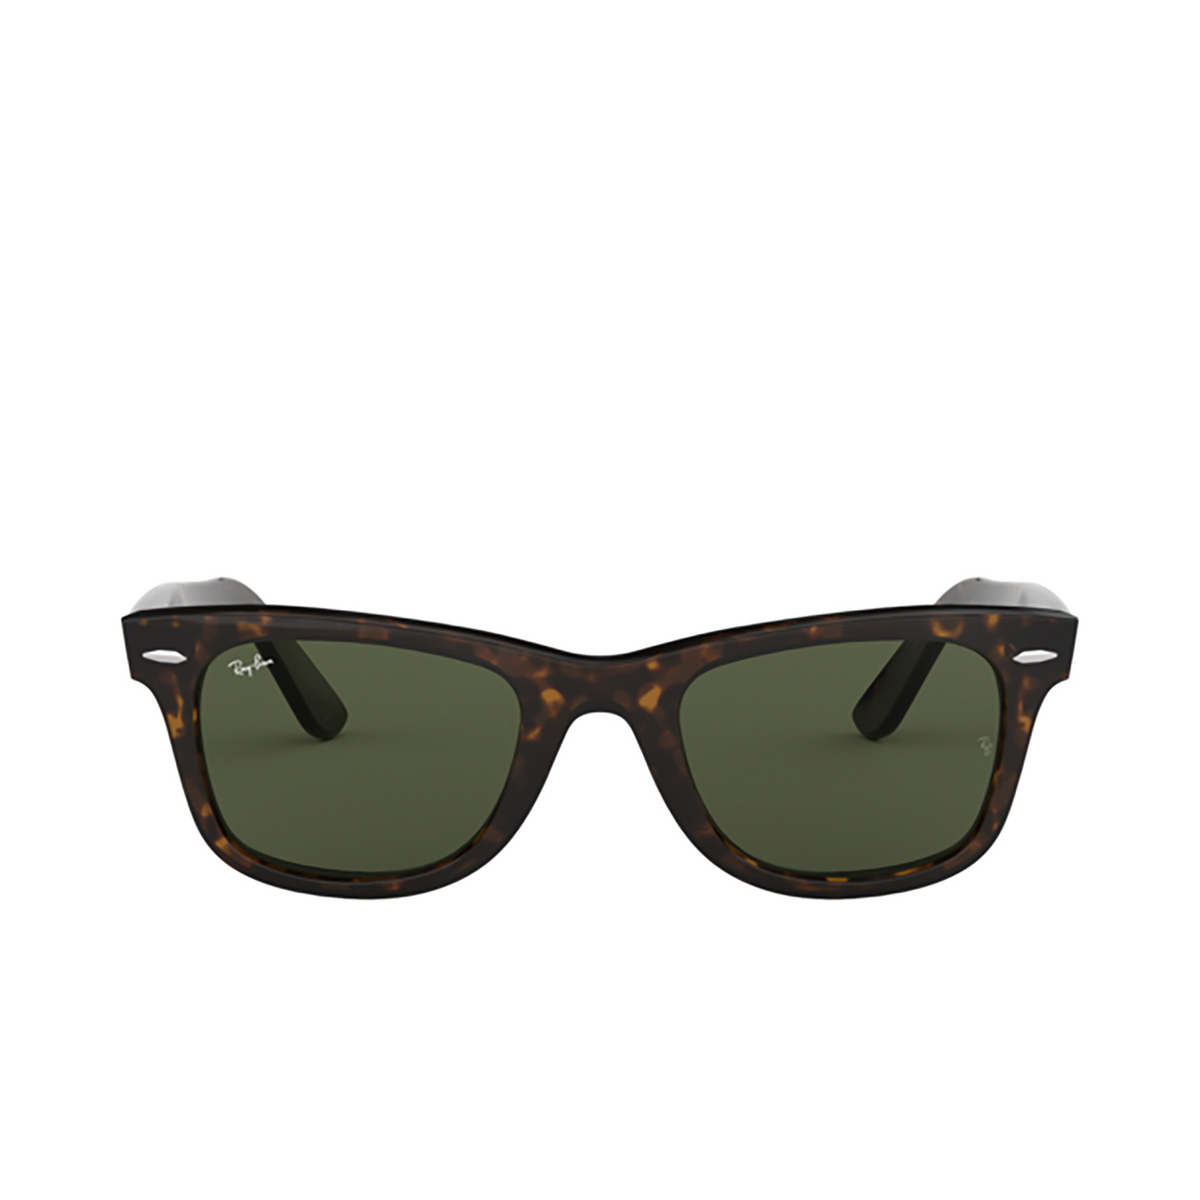 Ray-Ban® Square Sunglasses: Wayfarer RB2140 color Tortoise 902.